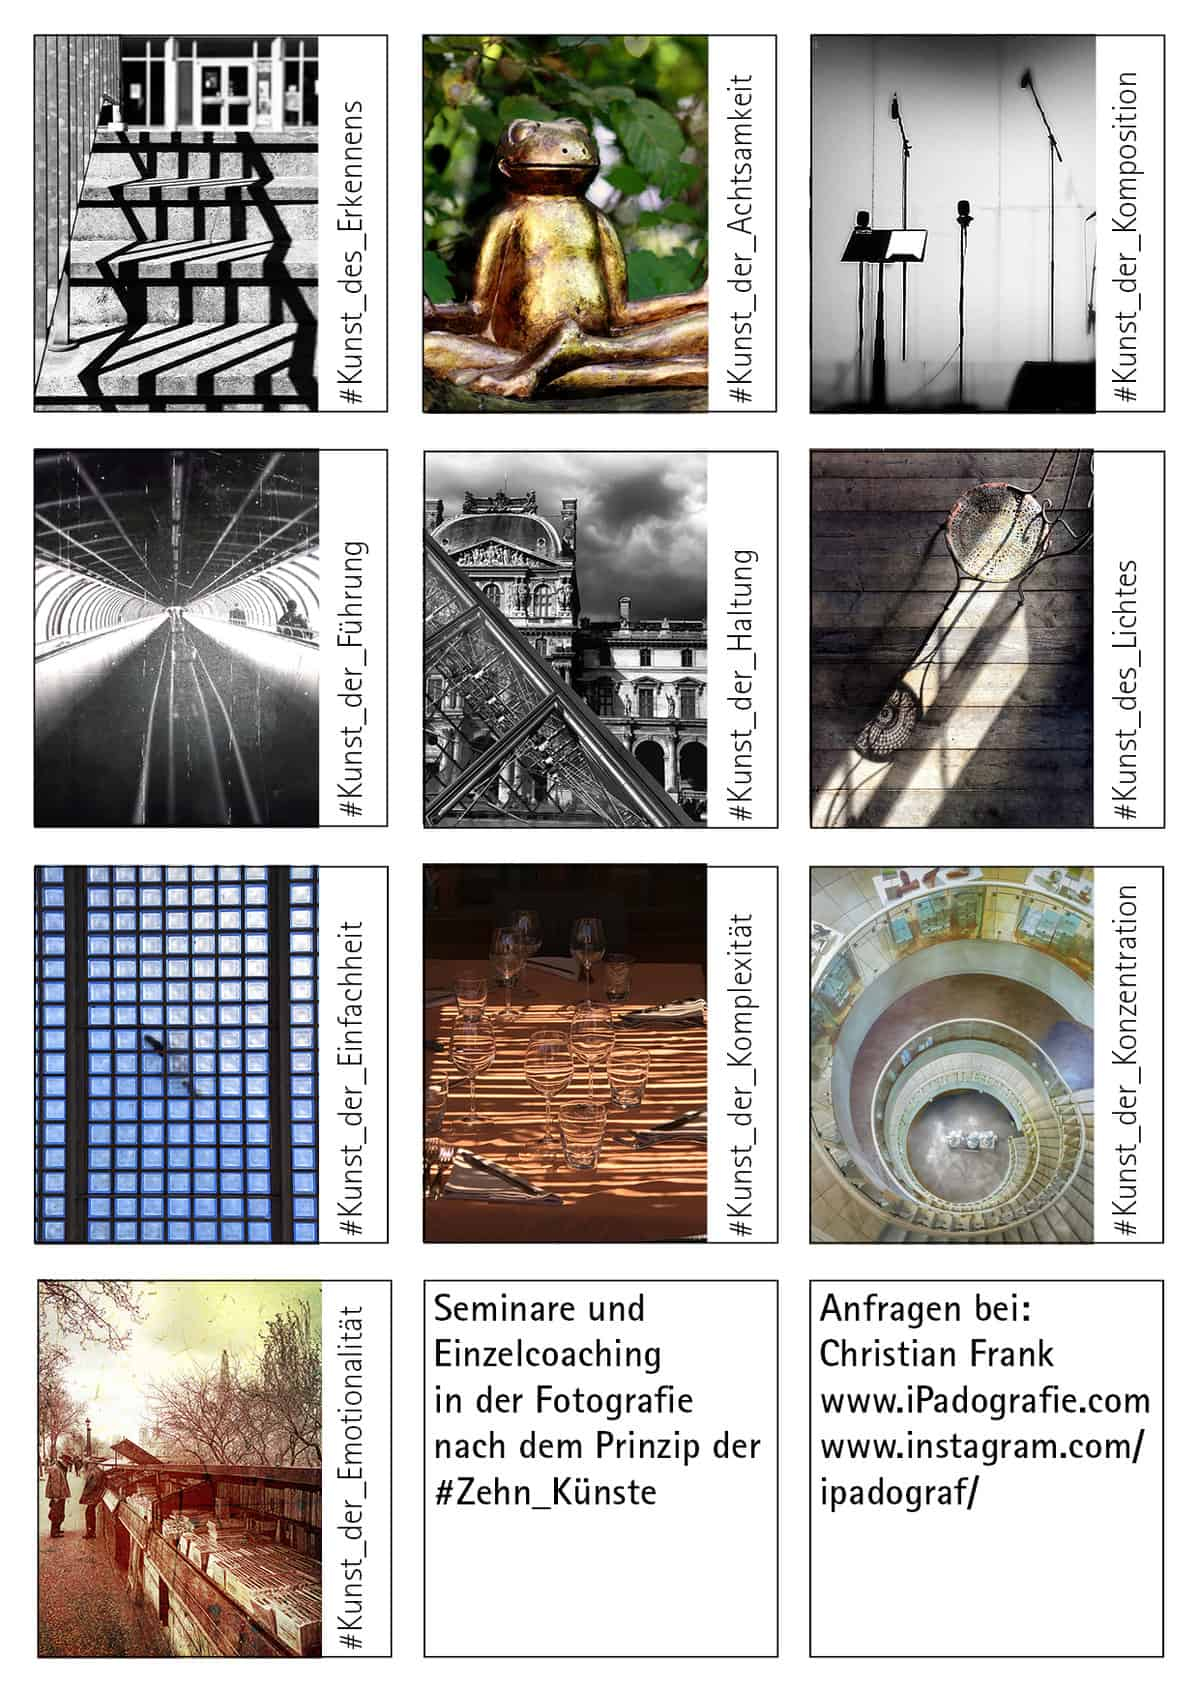 Fotoschule der Zehn Künste